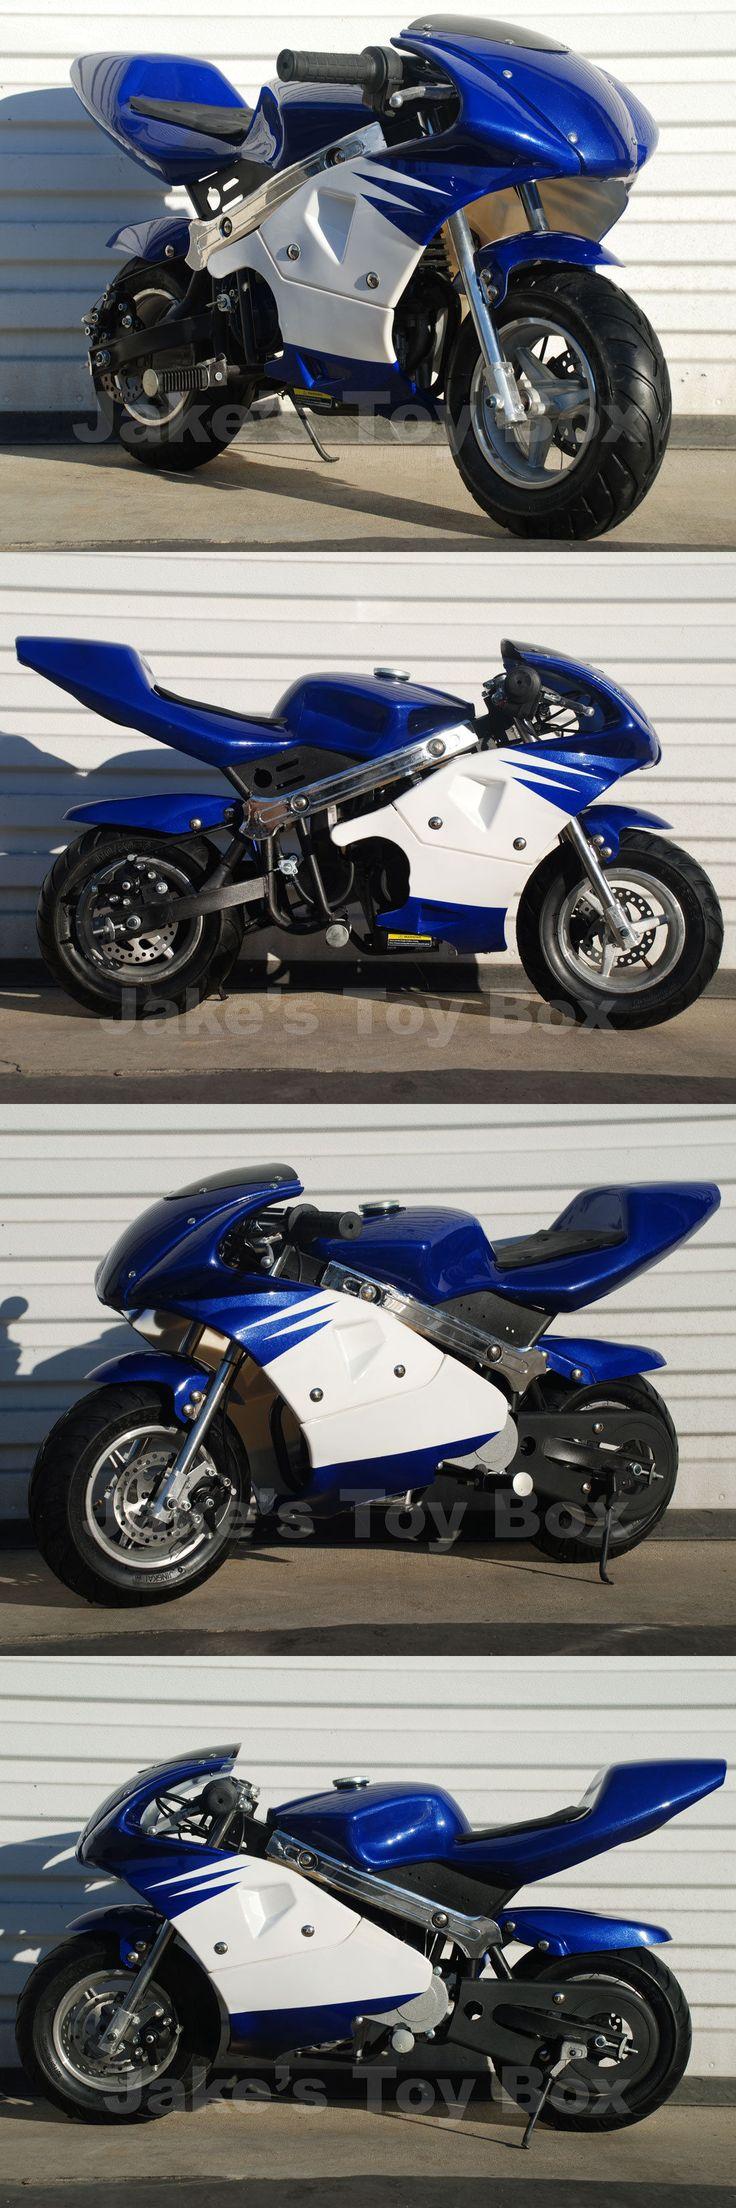 Gas Scooters 75211: Gas Powered Kids Mini Pocket Rocket 40Cc Pocket Bike - Blue BUY IT NOW ONLY: $275.0